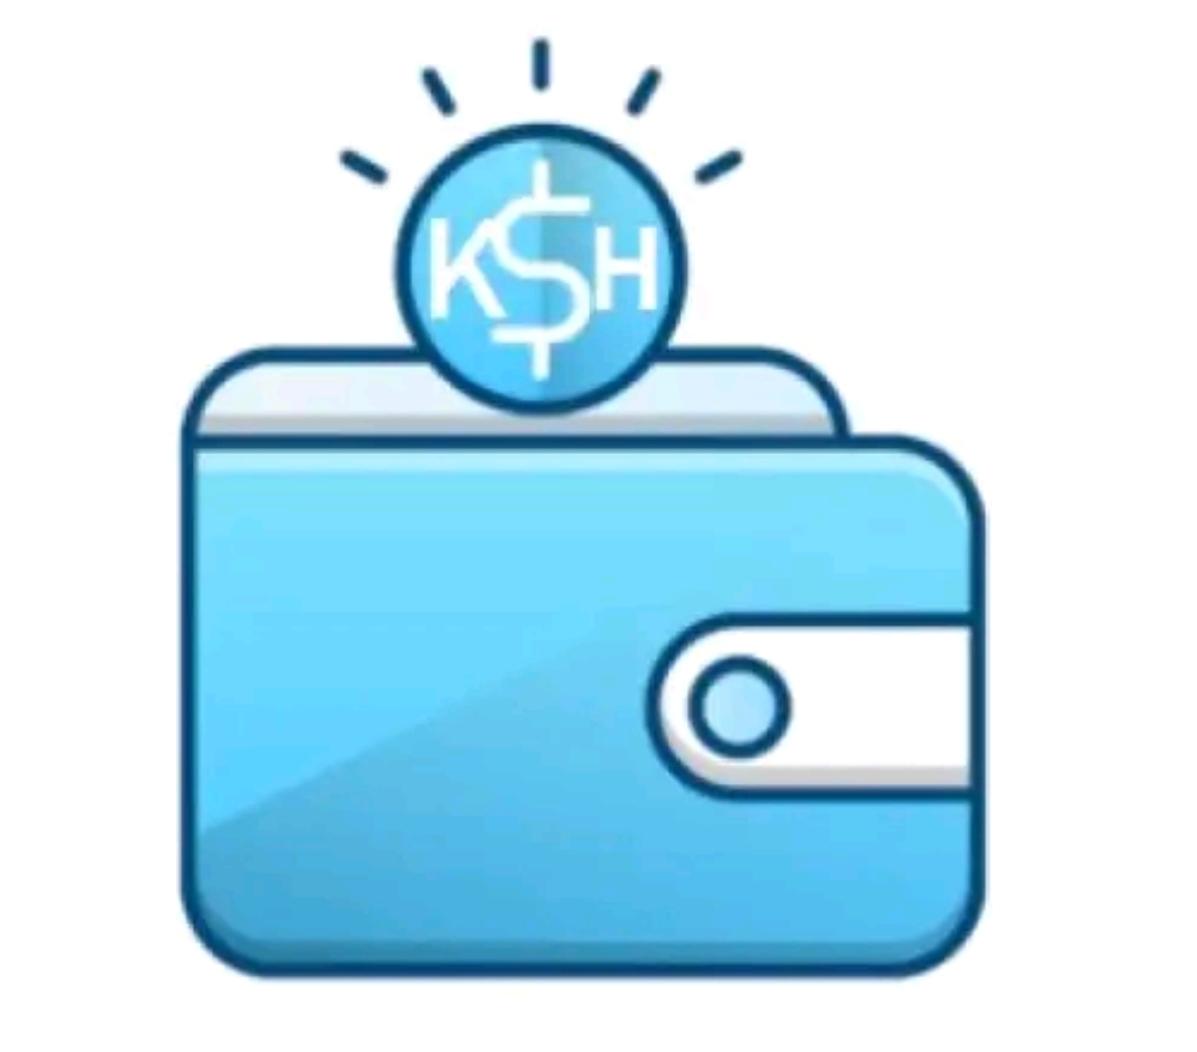 Kopesha loan app